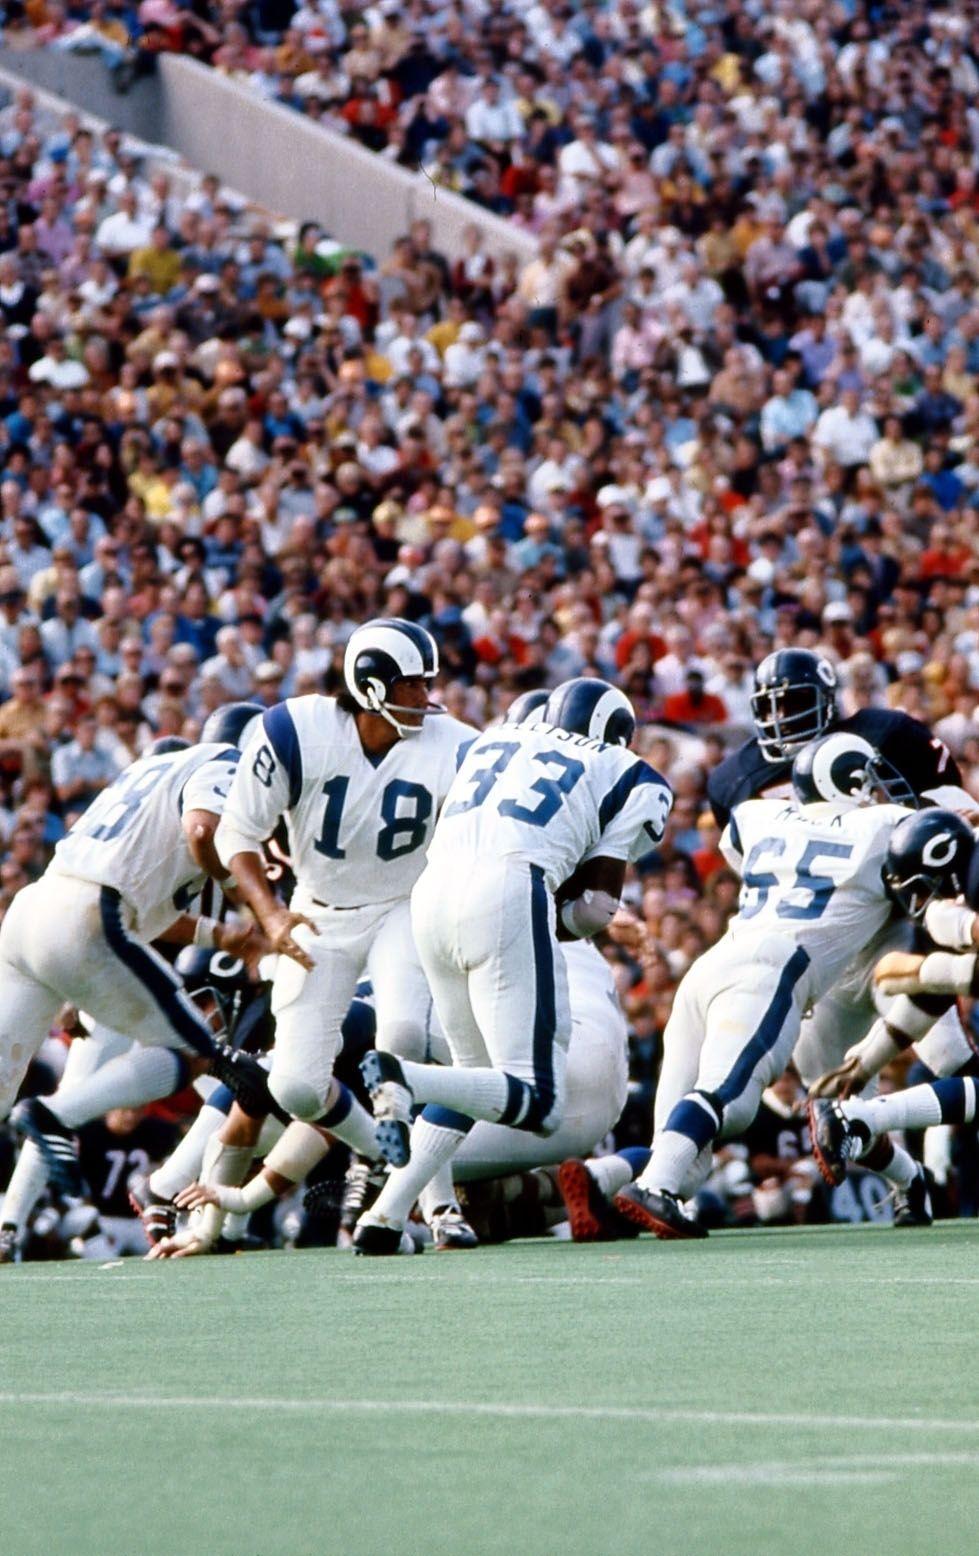 Roman Gabriel Los Angeles Rams 1972 Rams Football Nfl Football Players Nfl